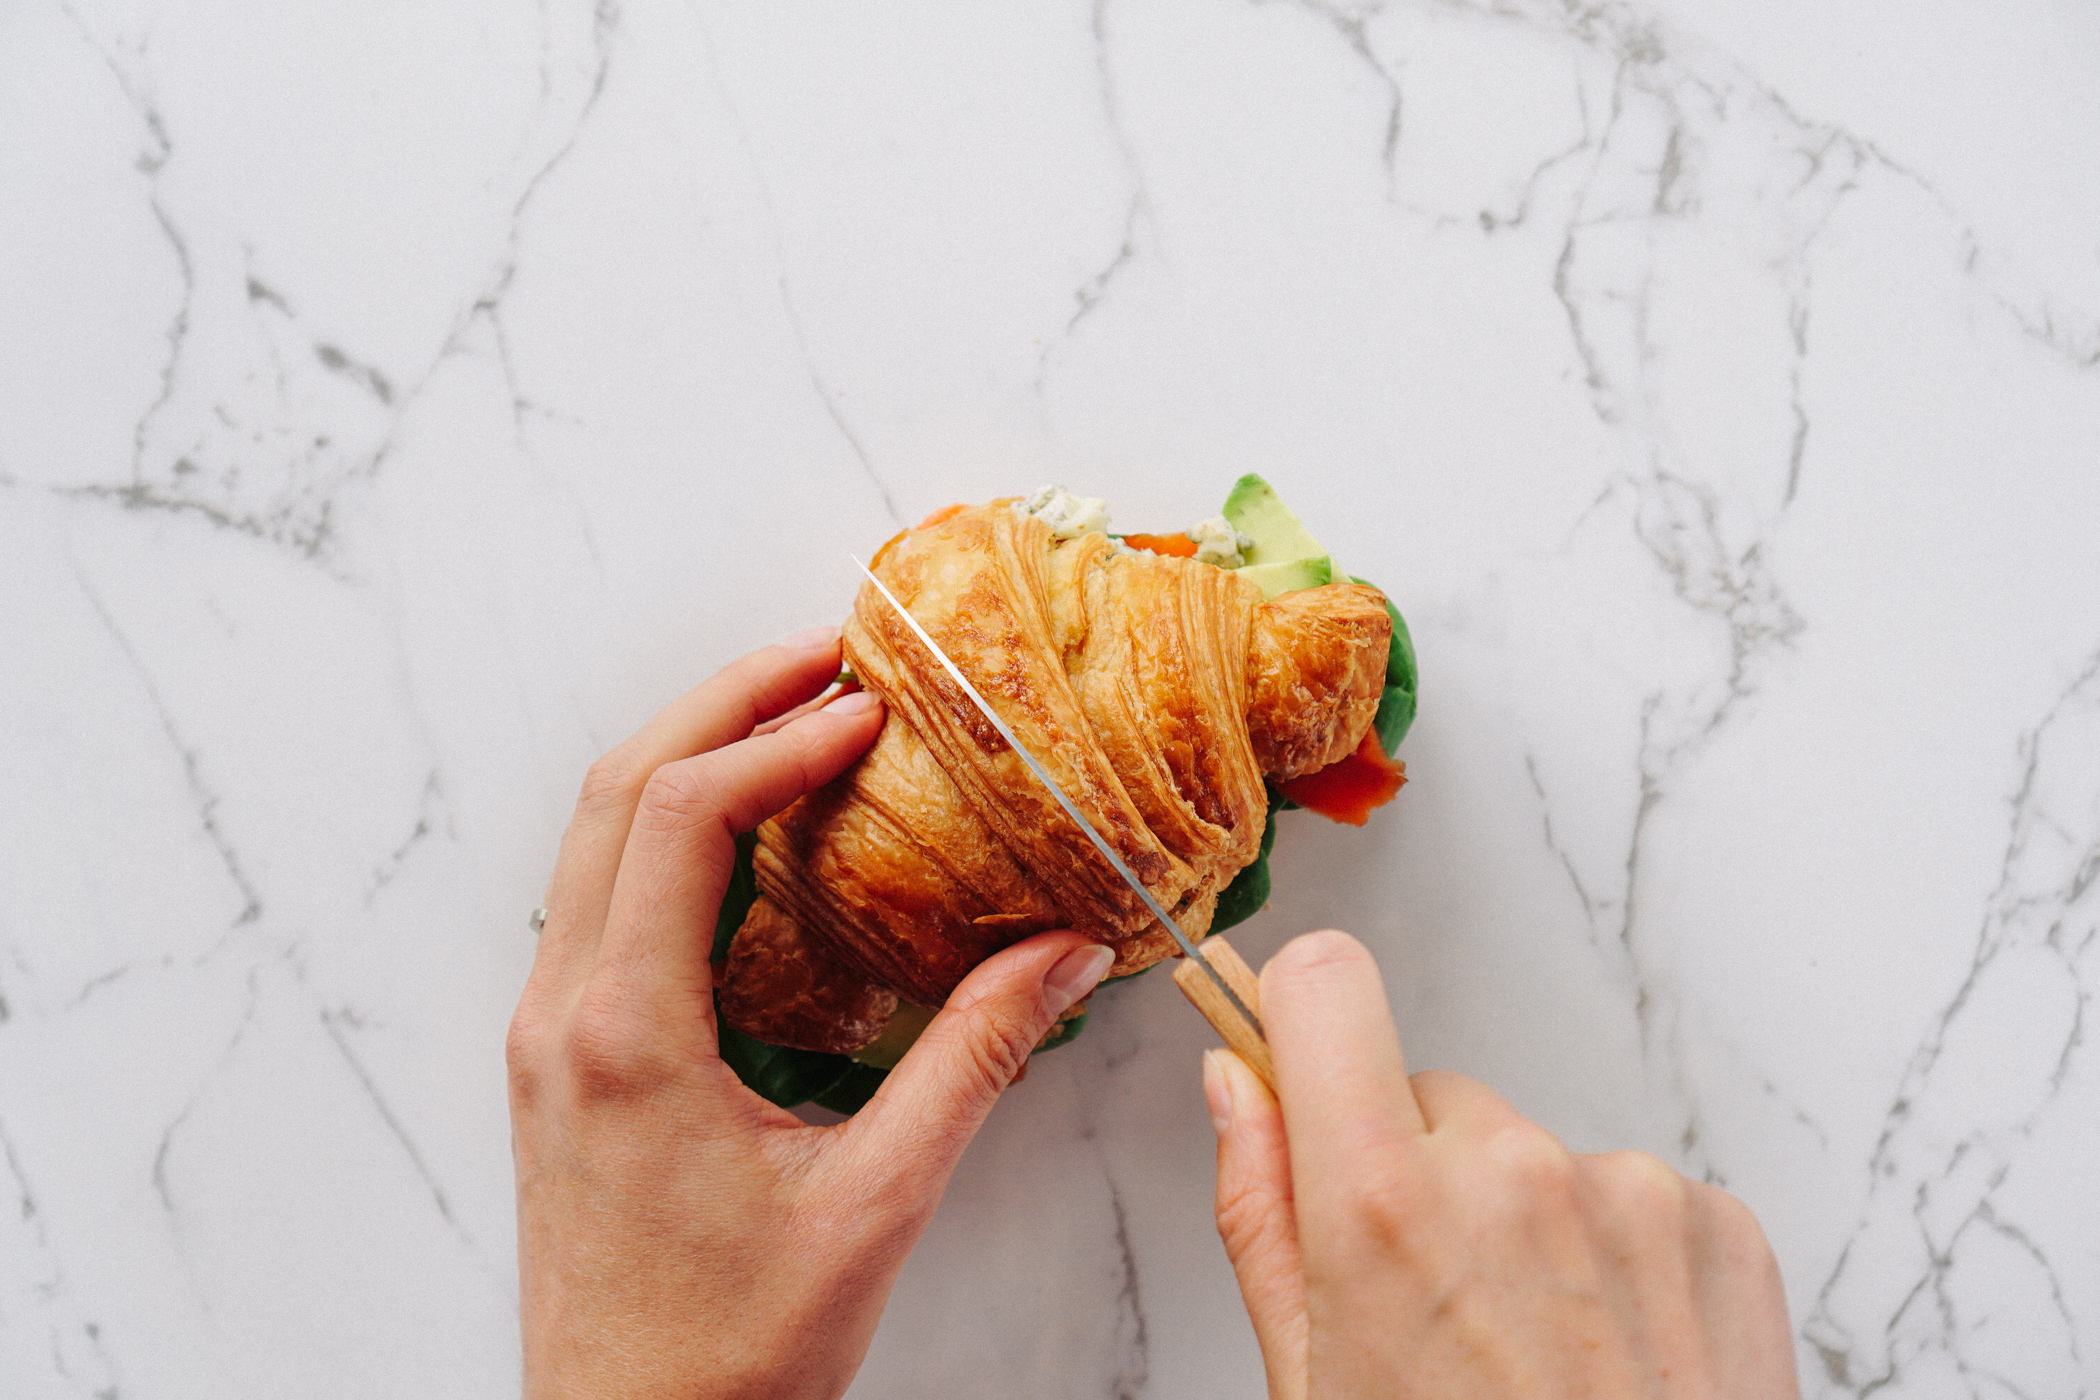 smoked_salmon_avocado_blue_cheese_croissant-9.jpg